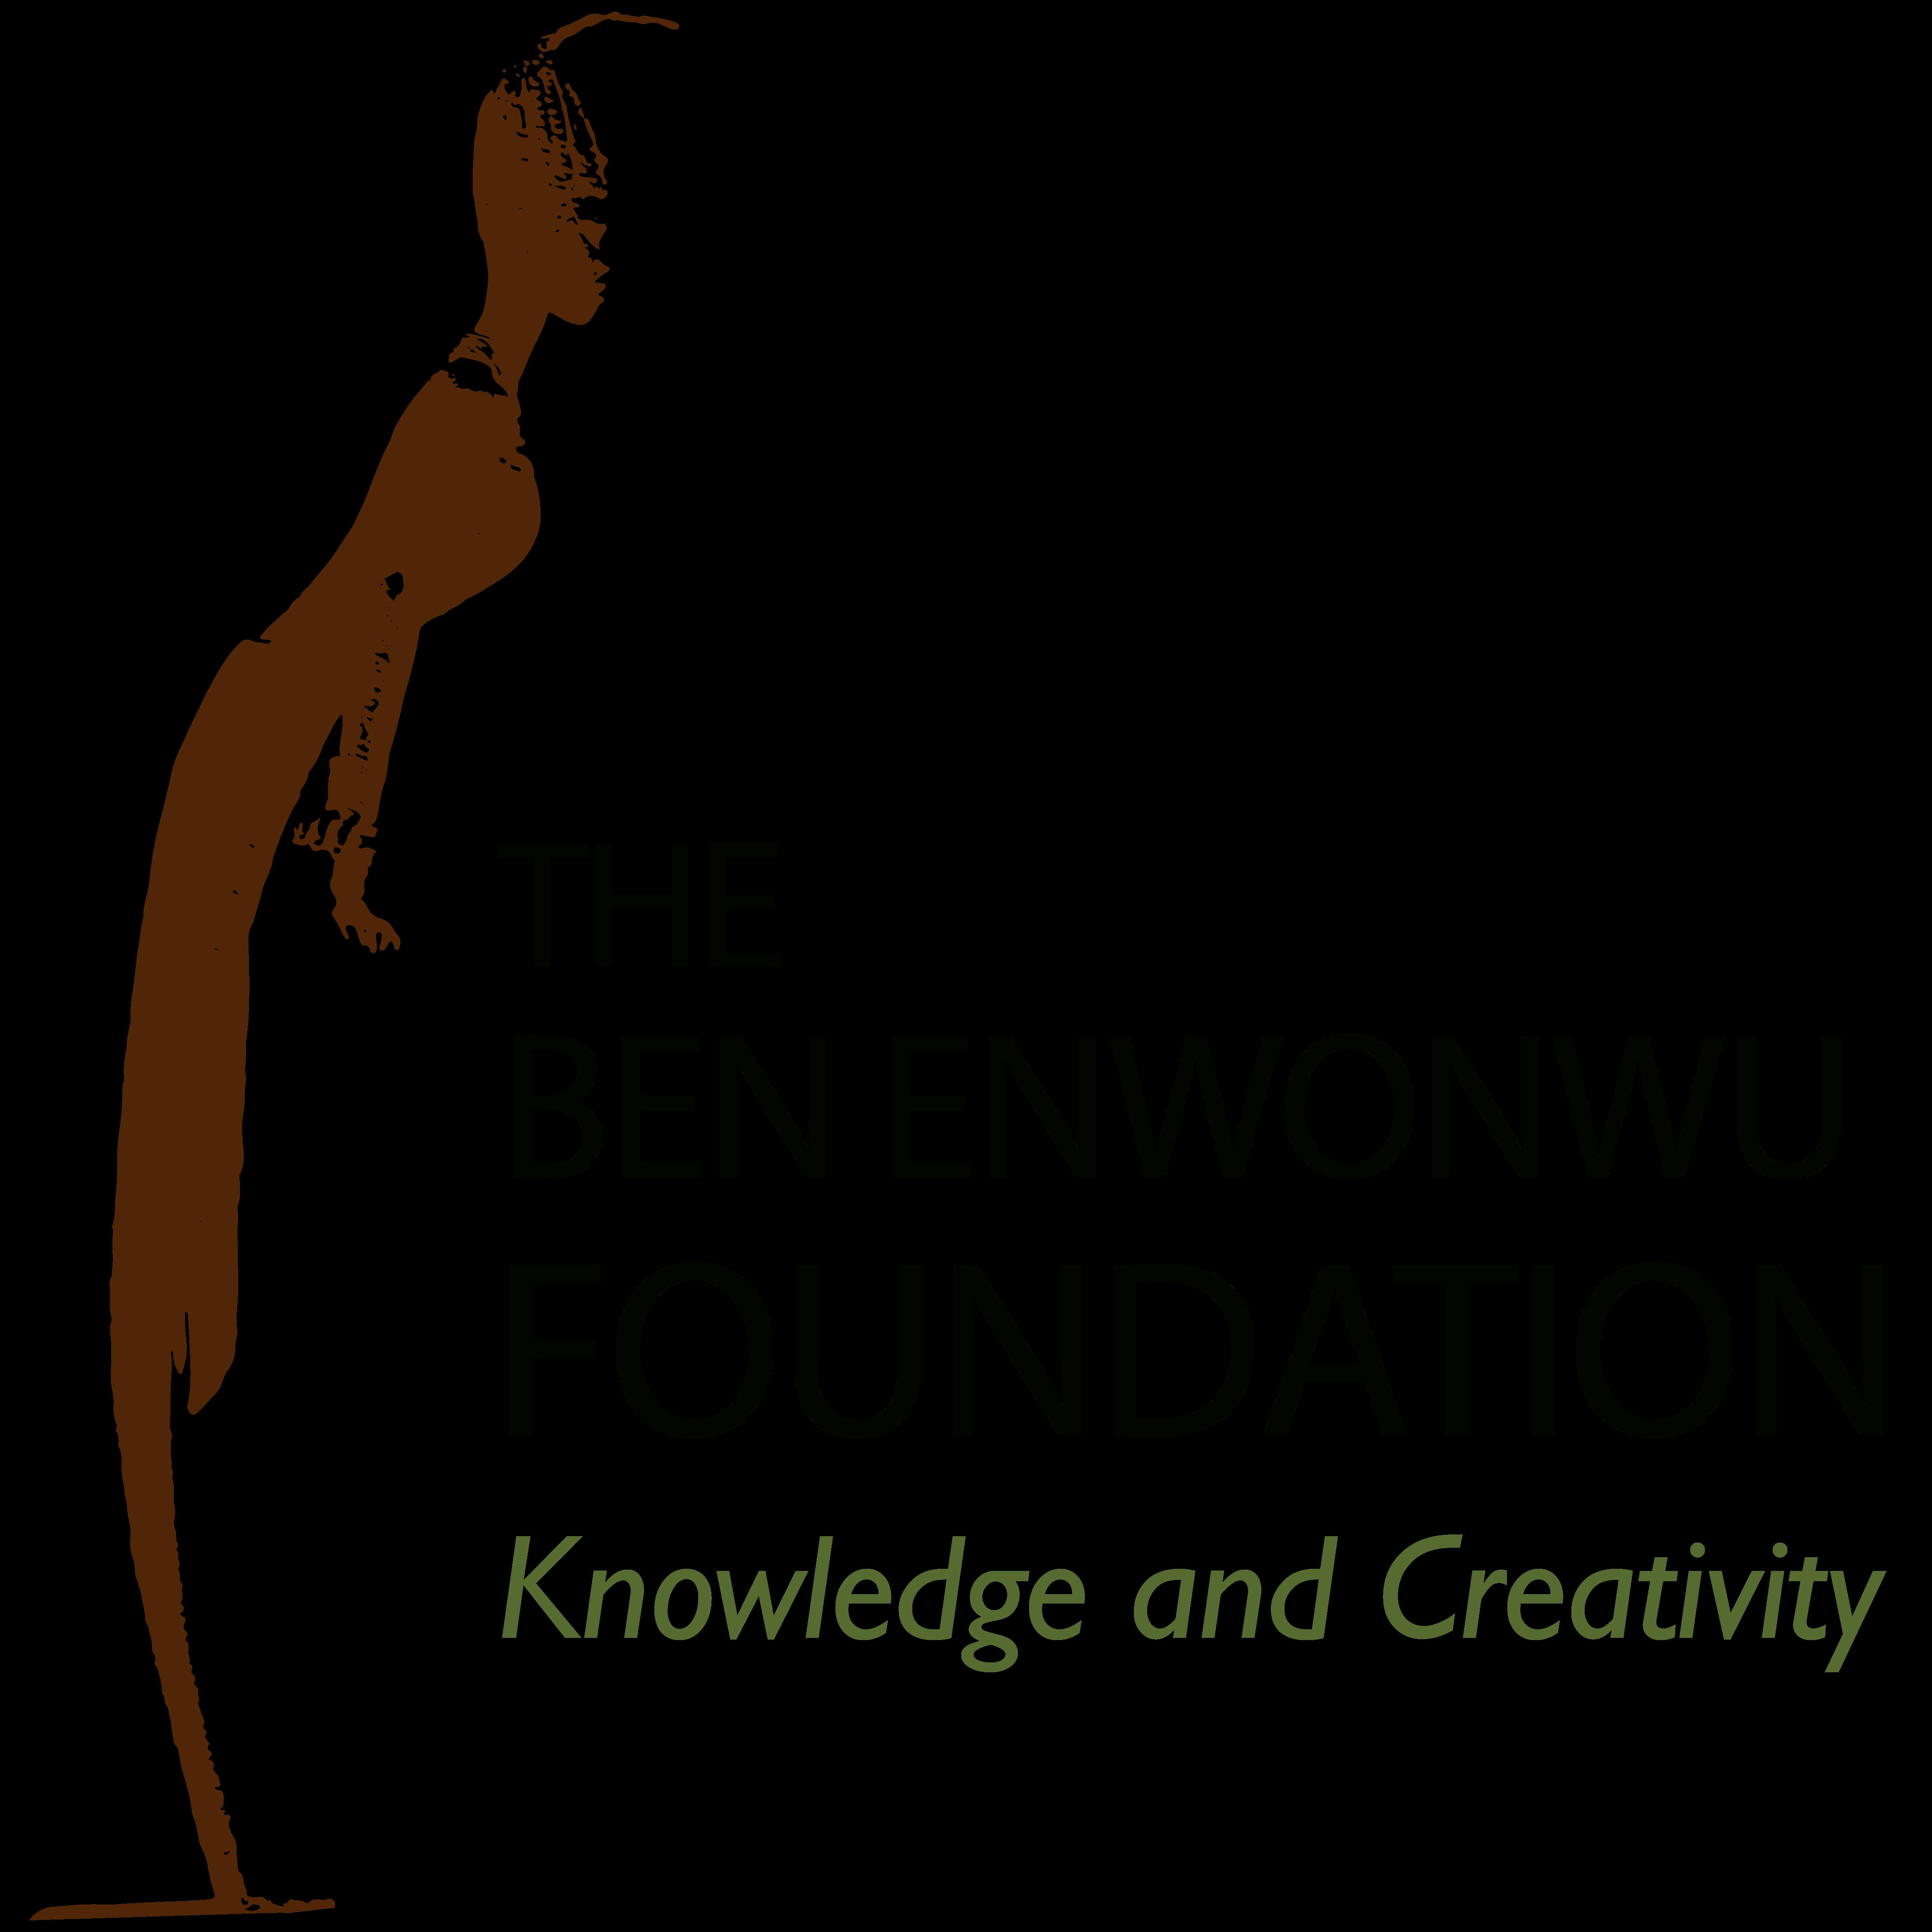 The Ben Enwonwu Foundation